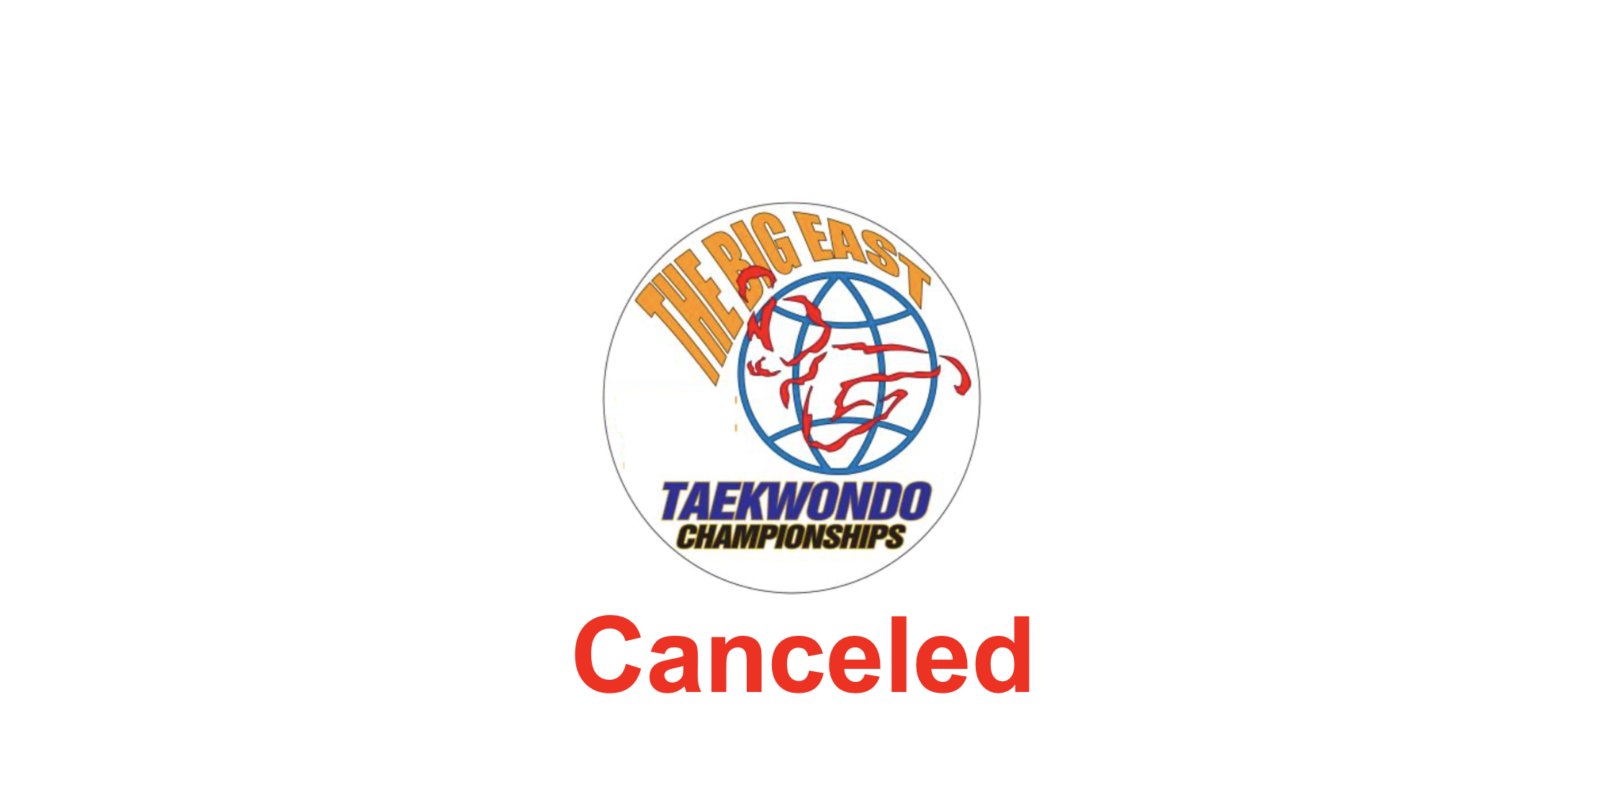 Suspension of the 2020 XXVII Big East Taekwondo Championships